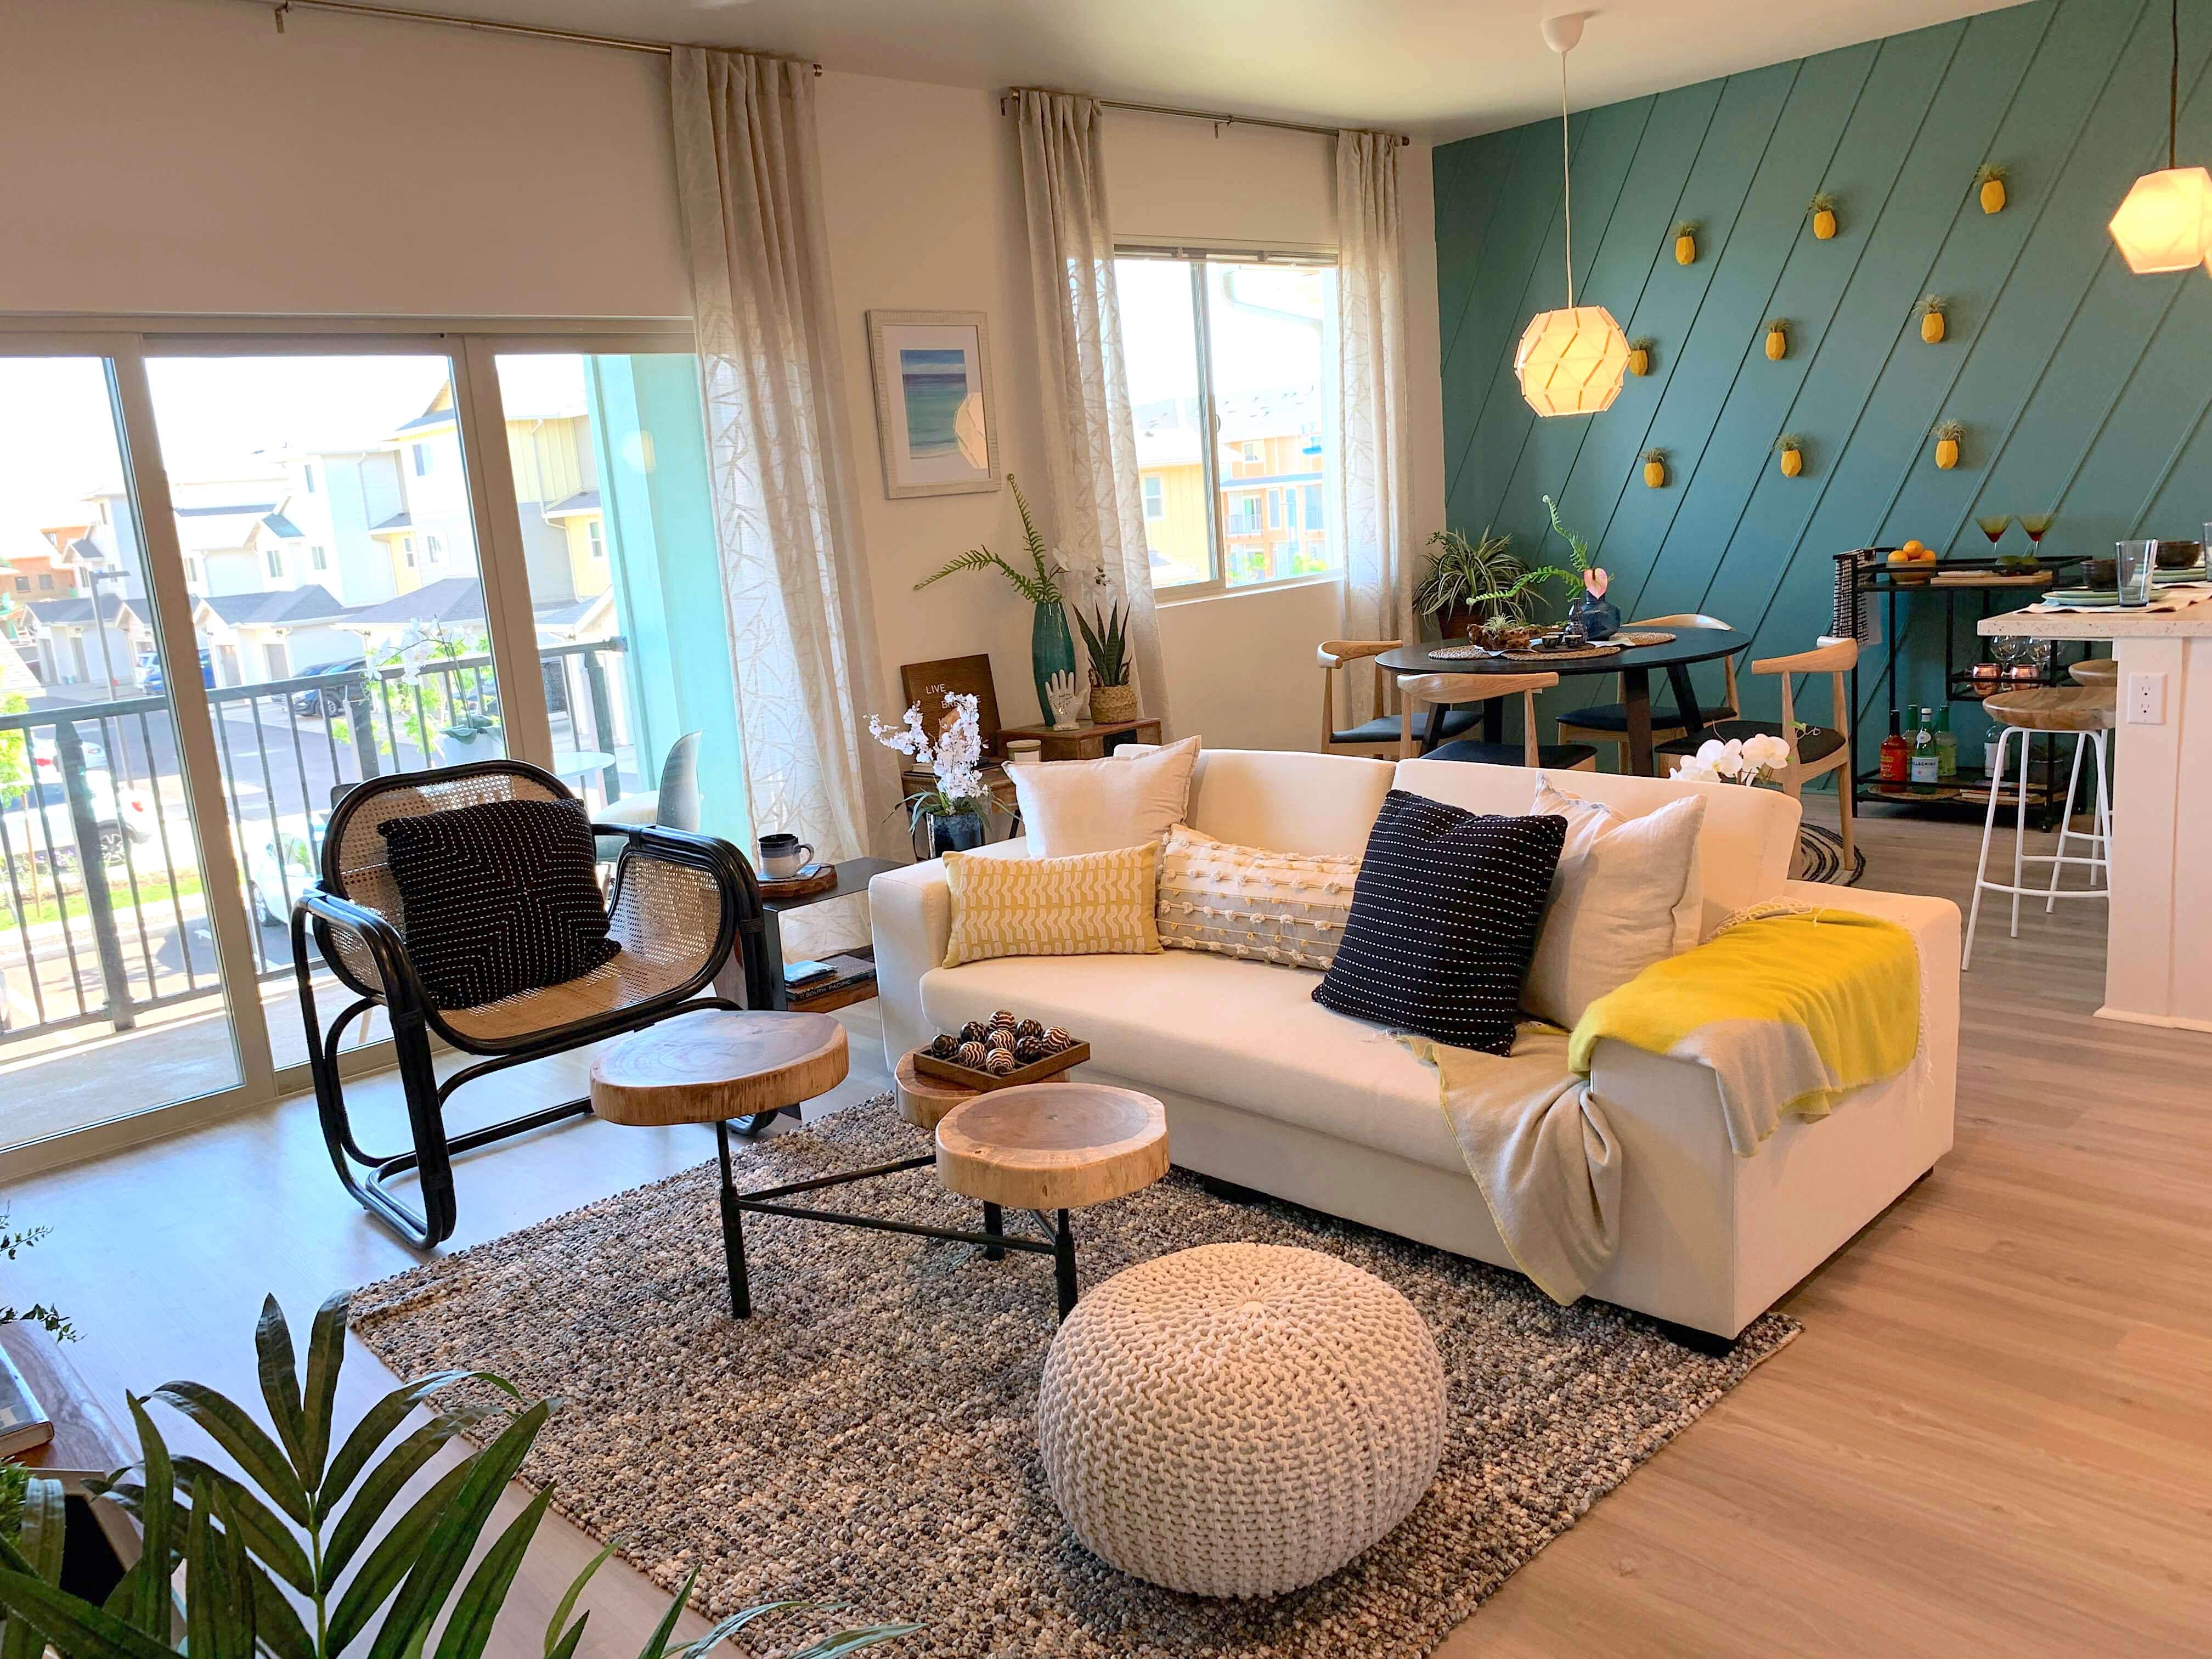 kohina at ho'opili living and dining room